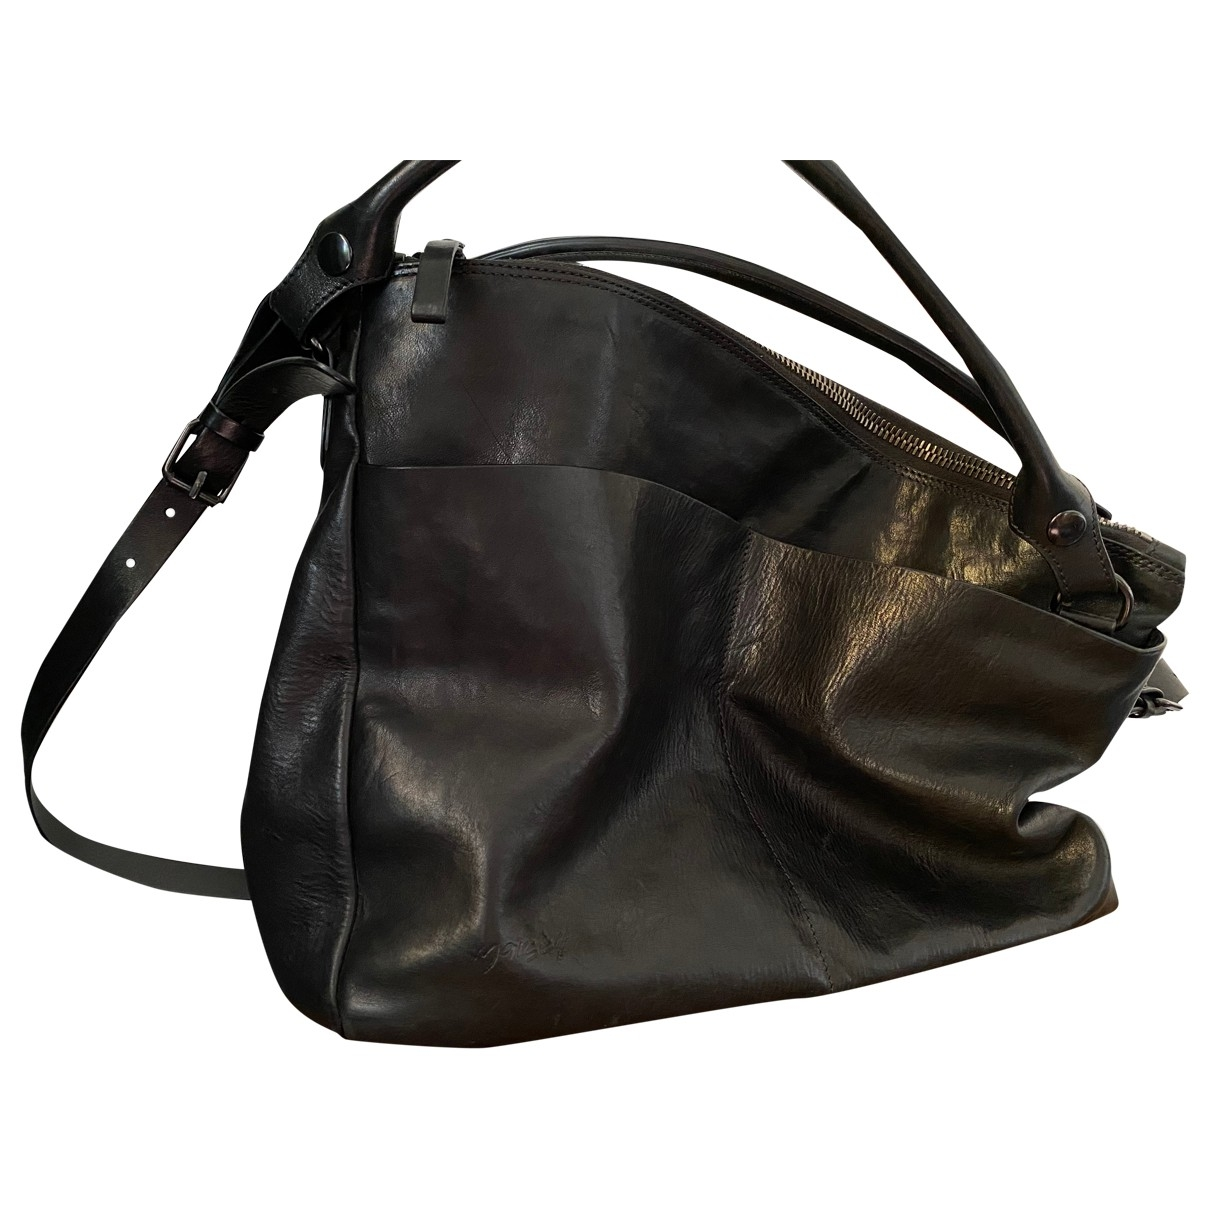 Marsell - Sac a main   pour femme en cuir - noir